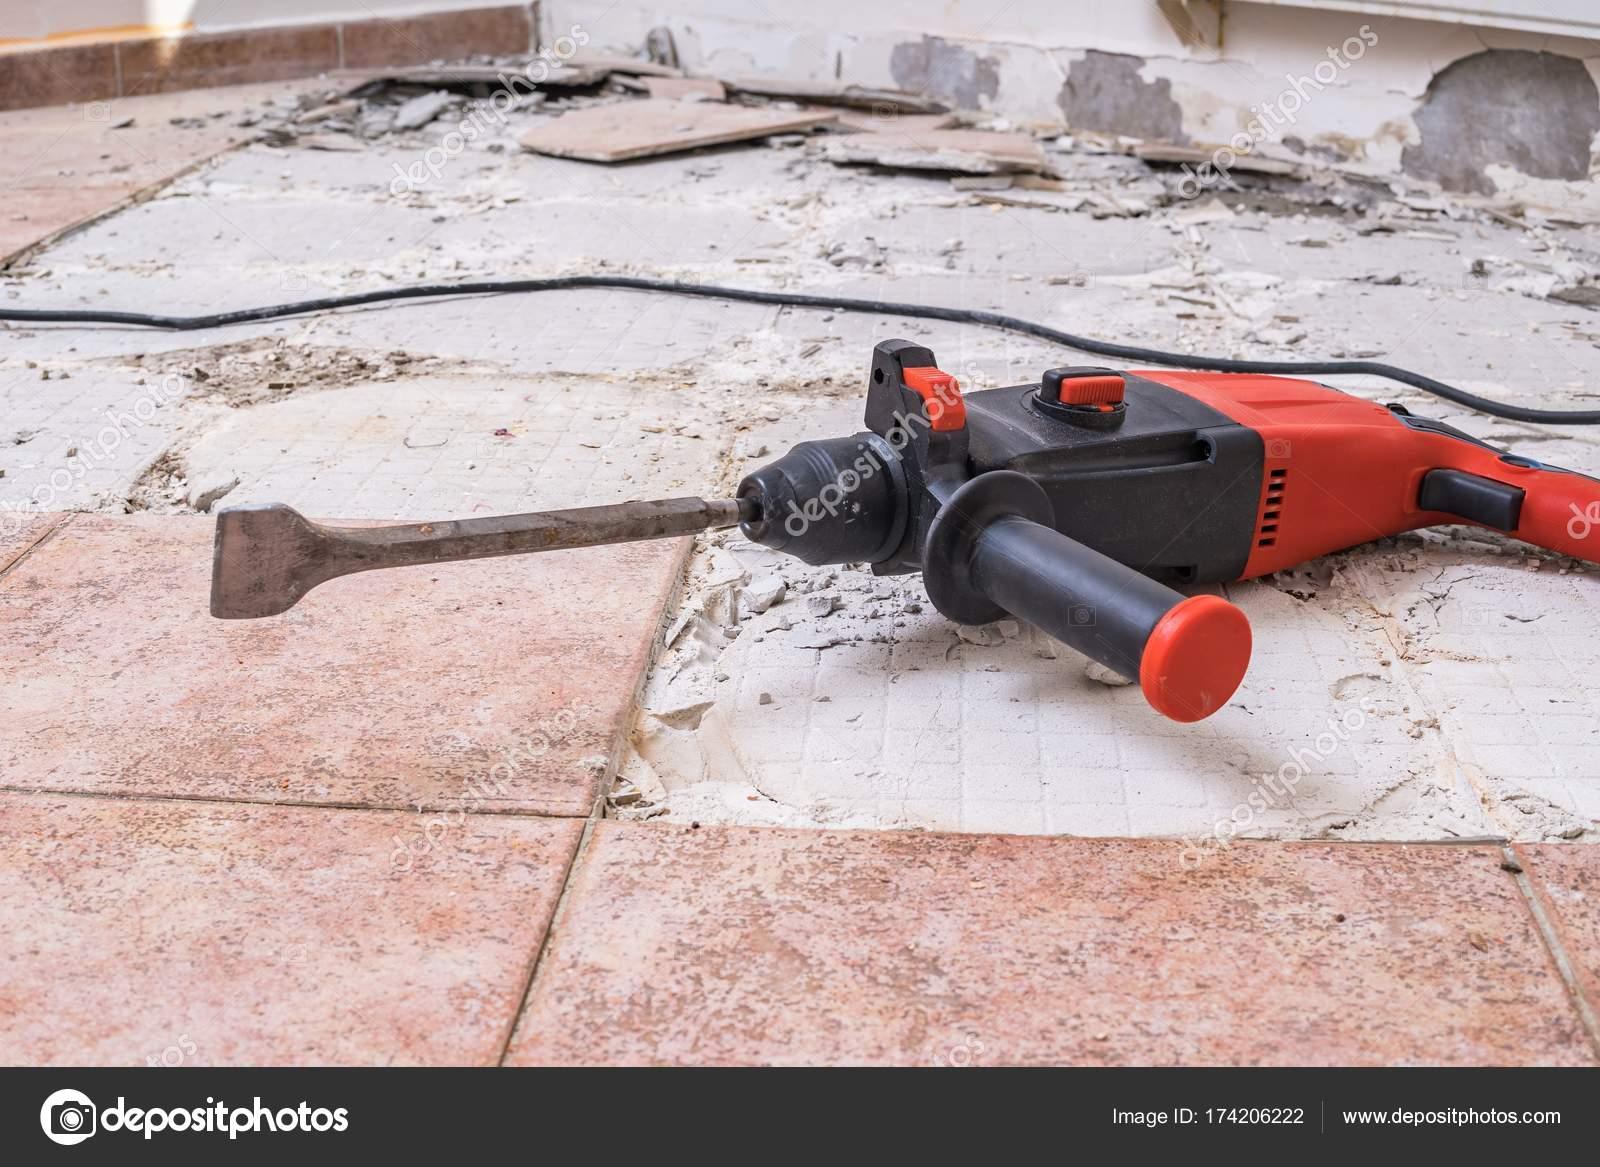 Quitar azulejos viejos Martillo perforador  perforacin